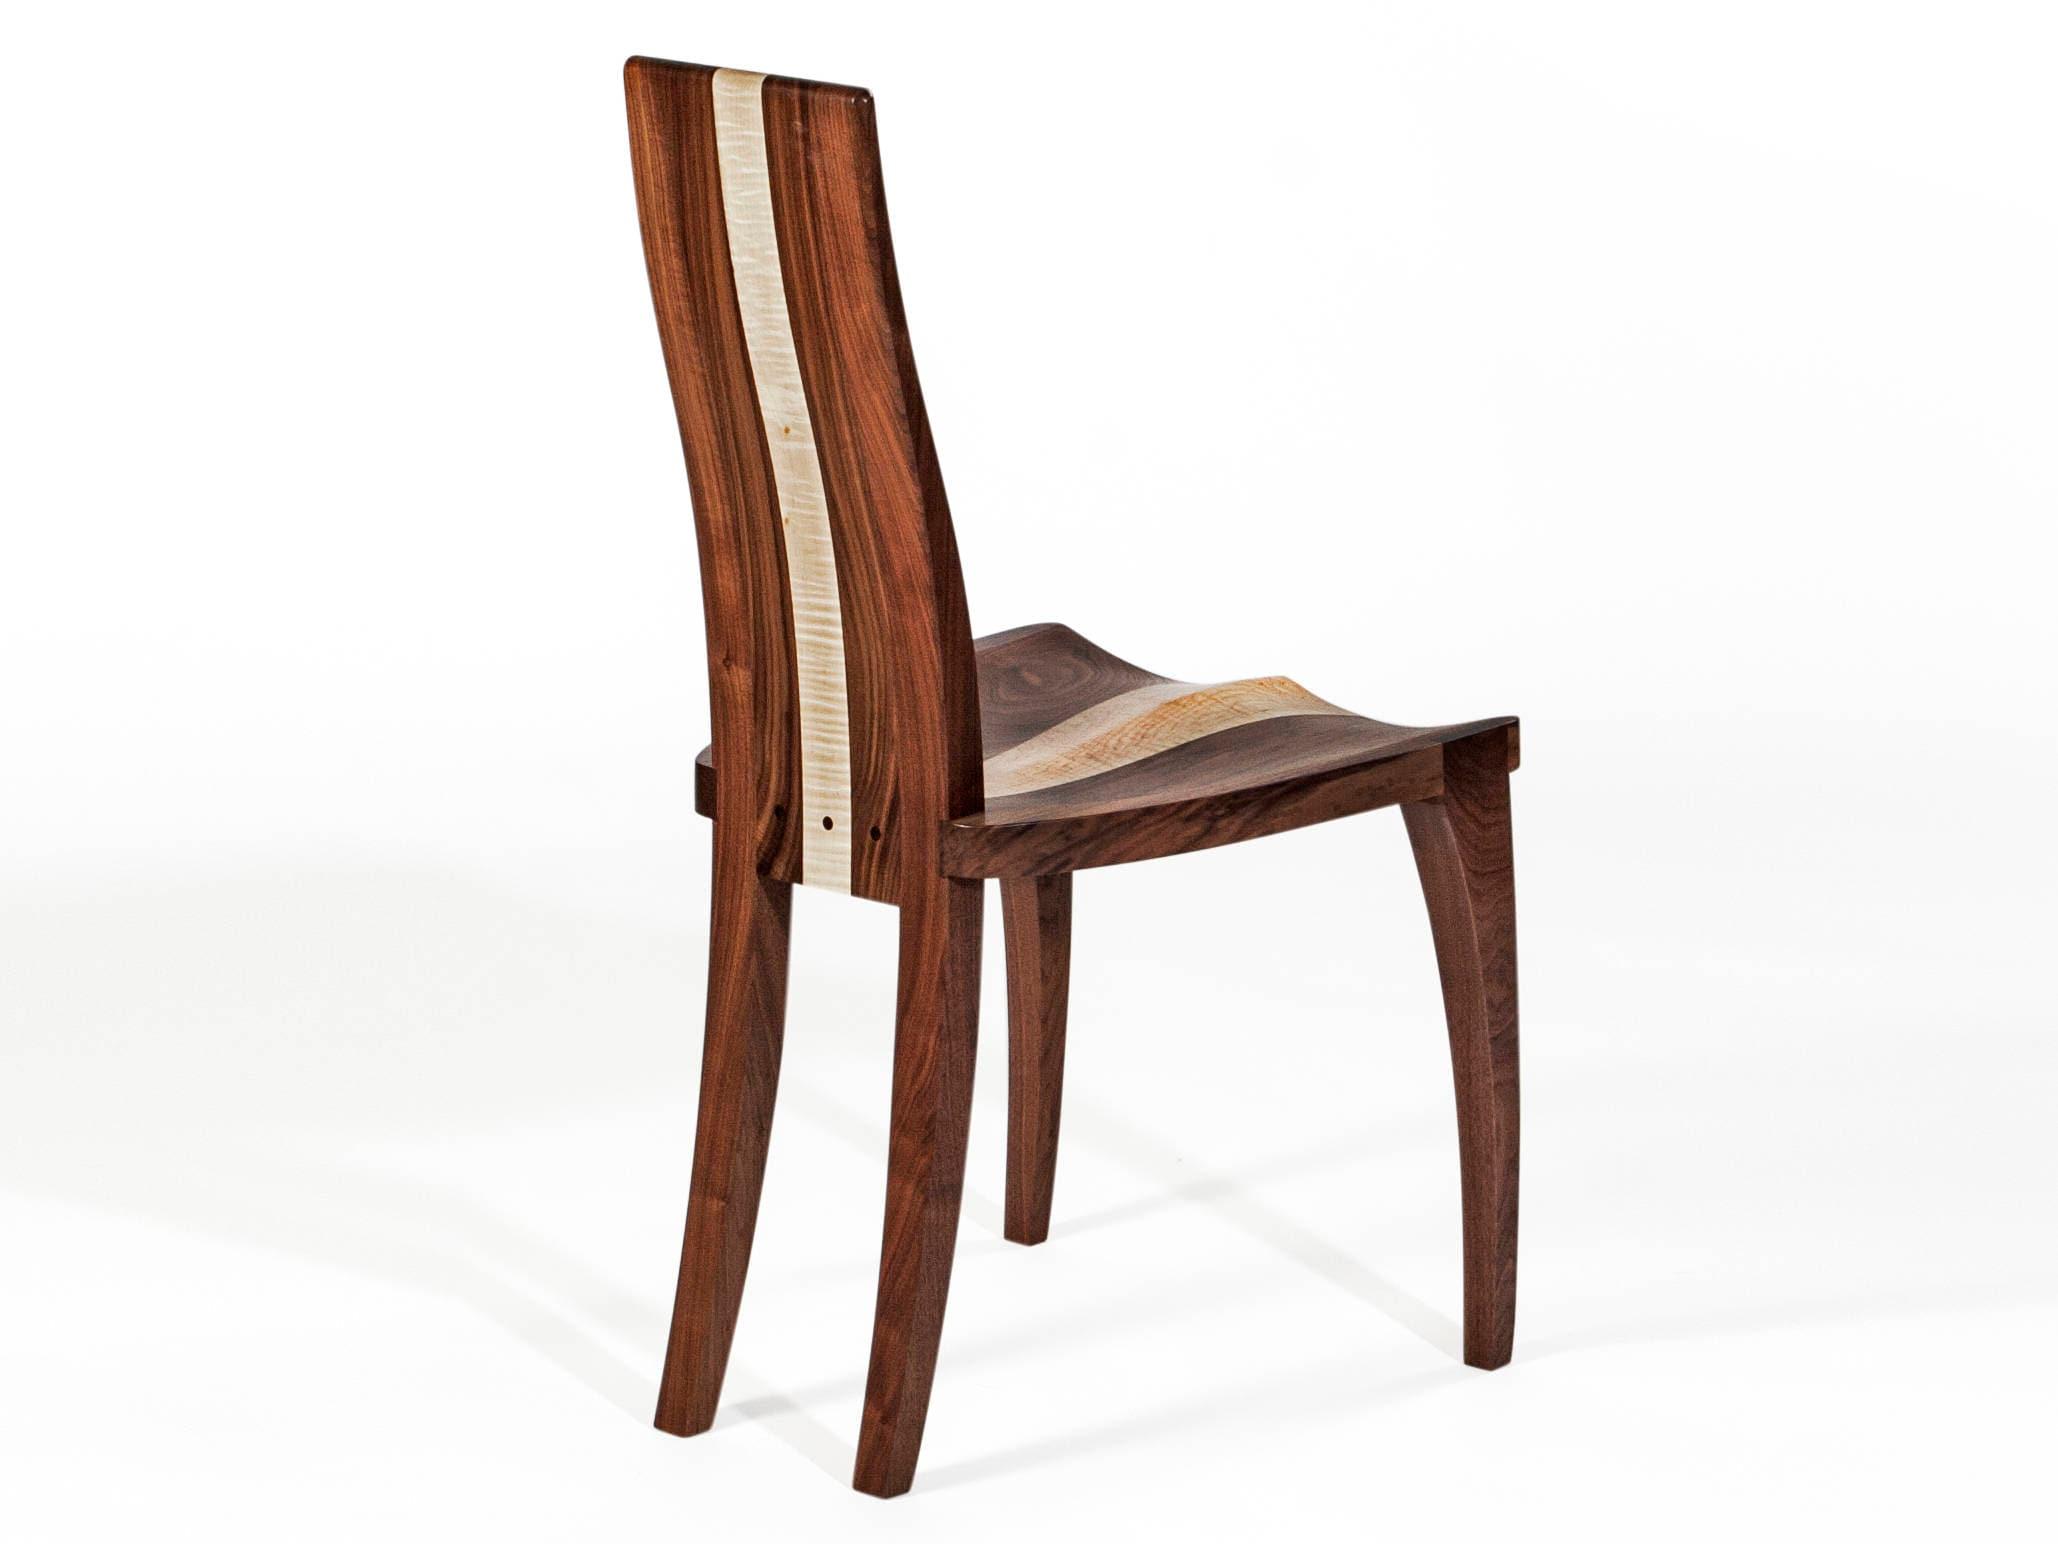 dining chair chair wooden chair kitchen chair handmade